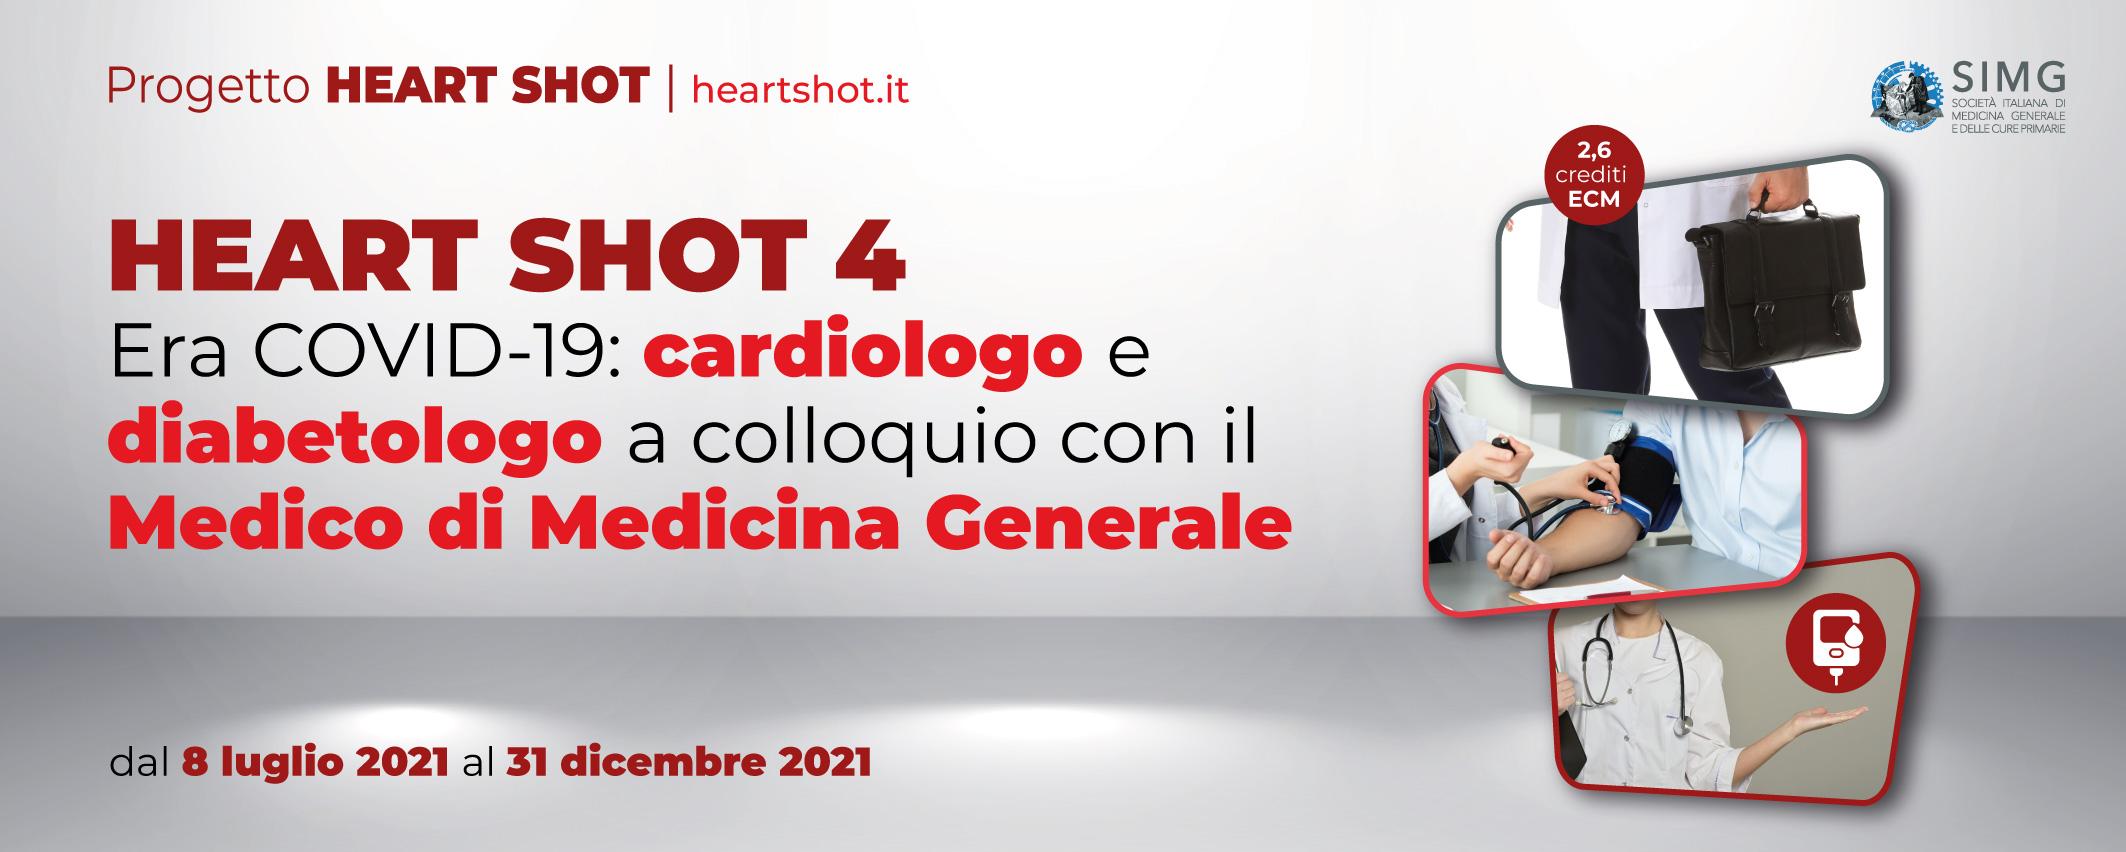 HEART SHOT 4